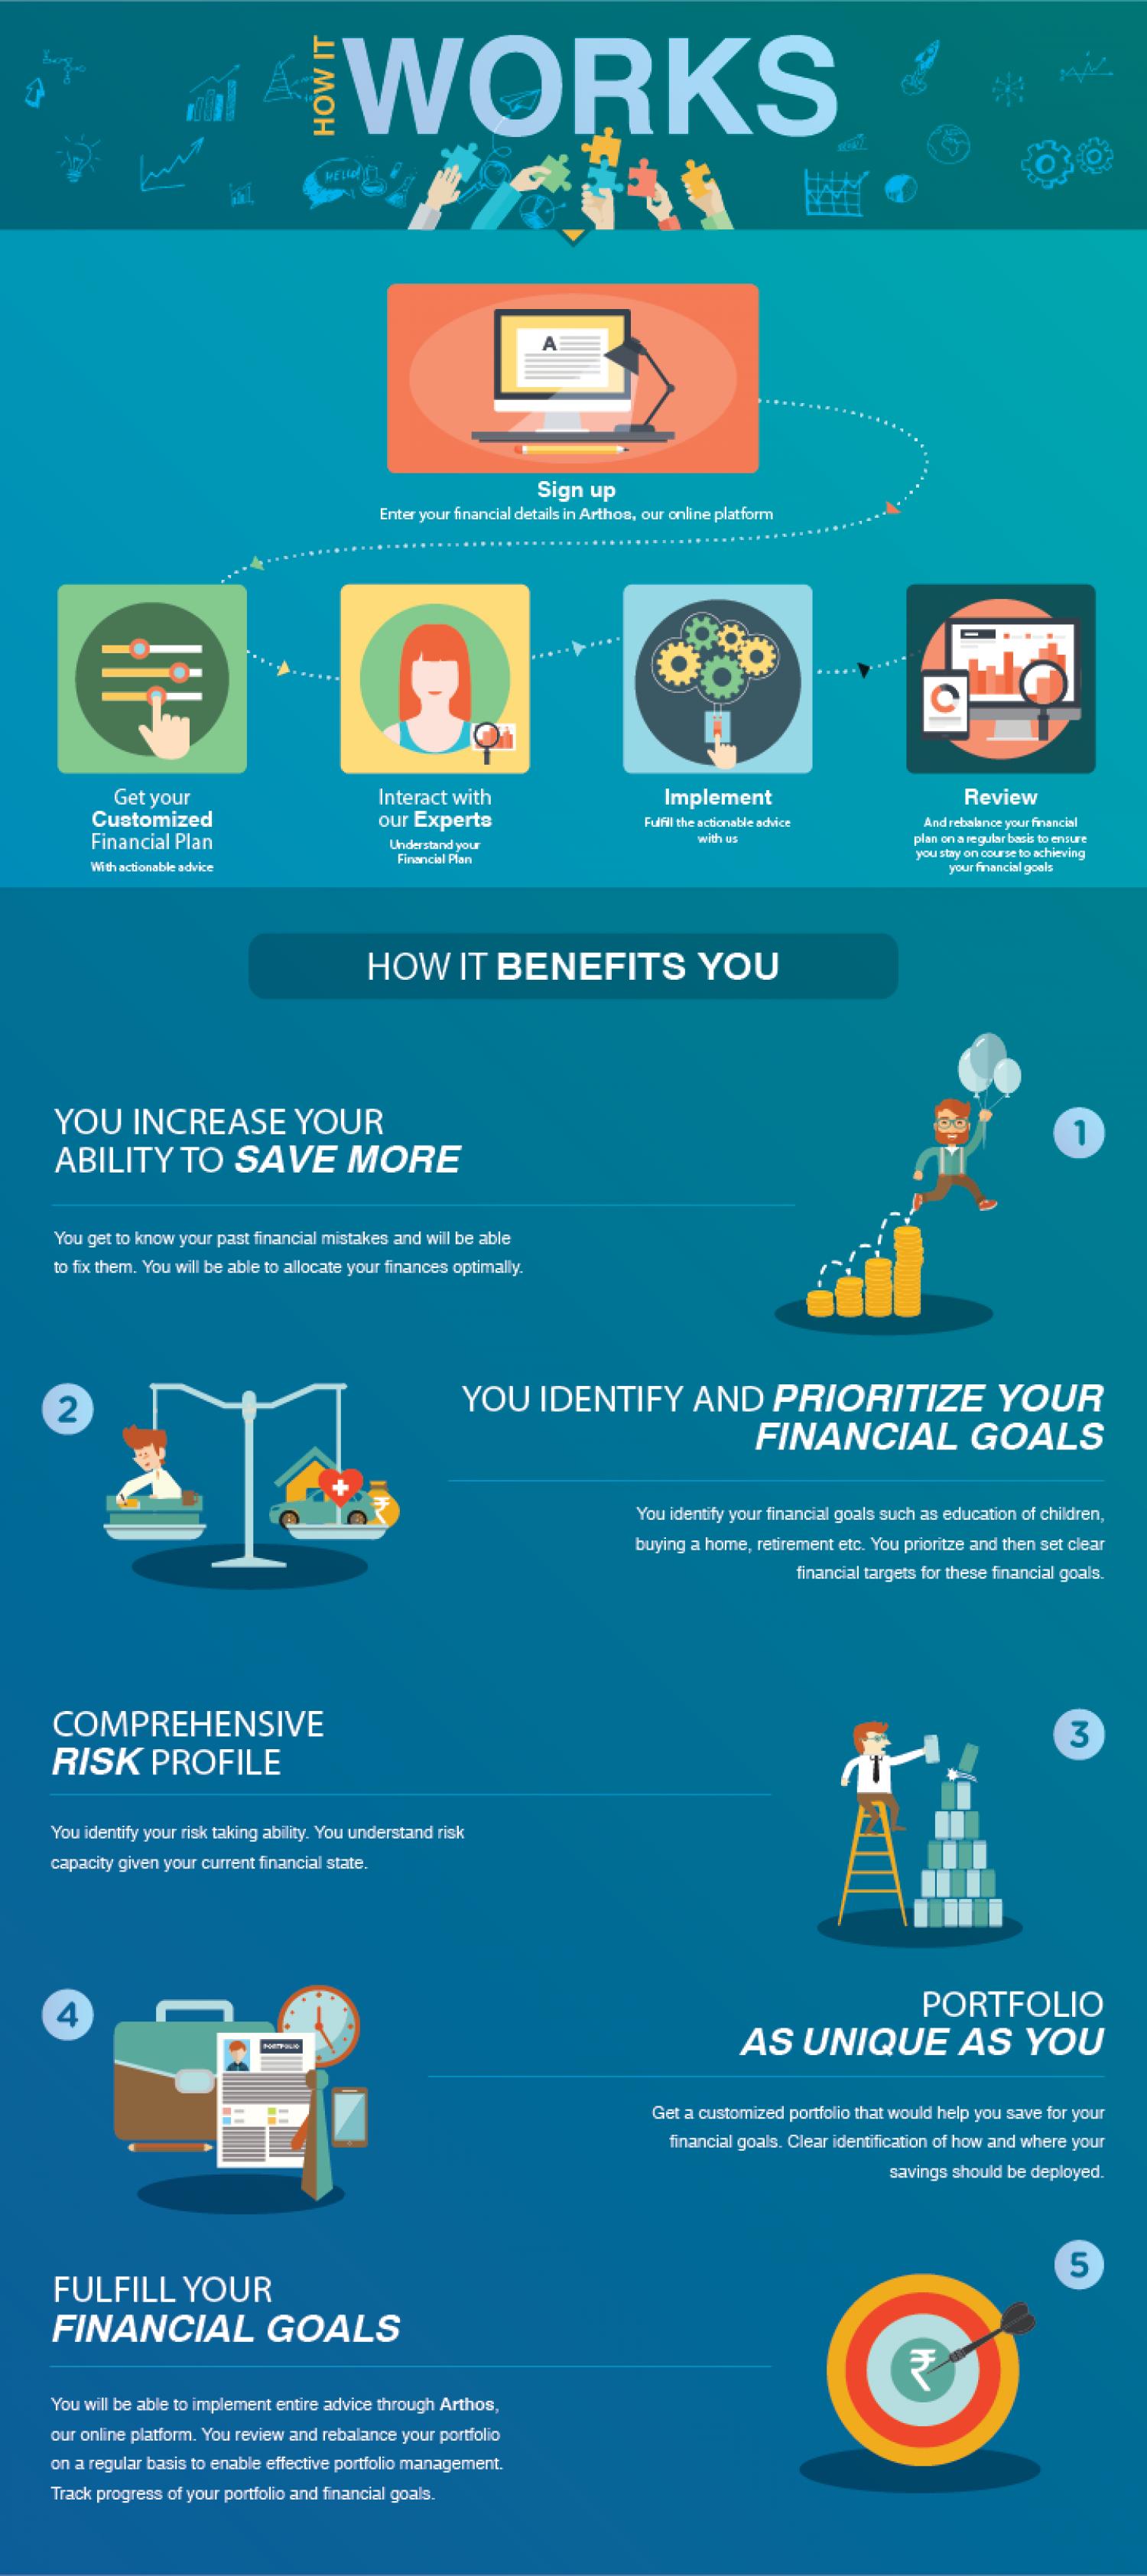 Best online financial planning firm in India Robo